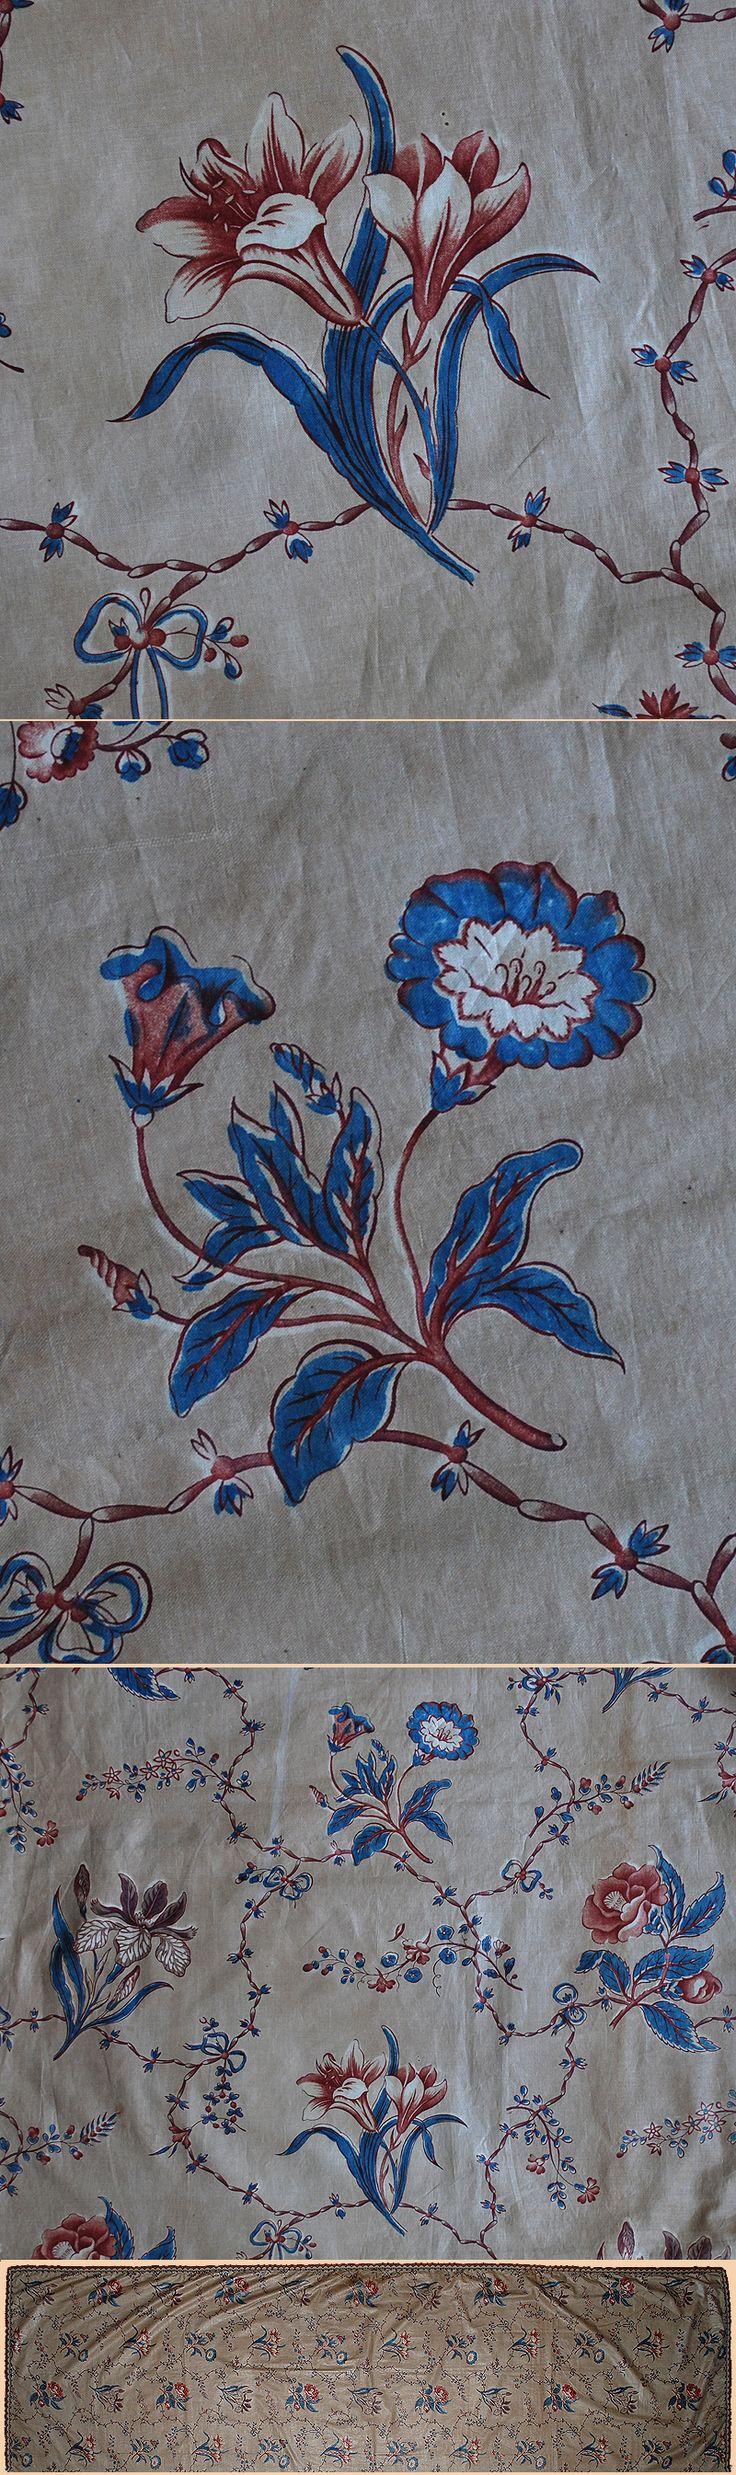 French Textile, Print on Cotton Oriental Scenes by: Koechlin Ziegler Design by Zipelius Cirica 1824-1840